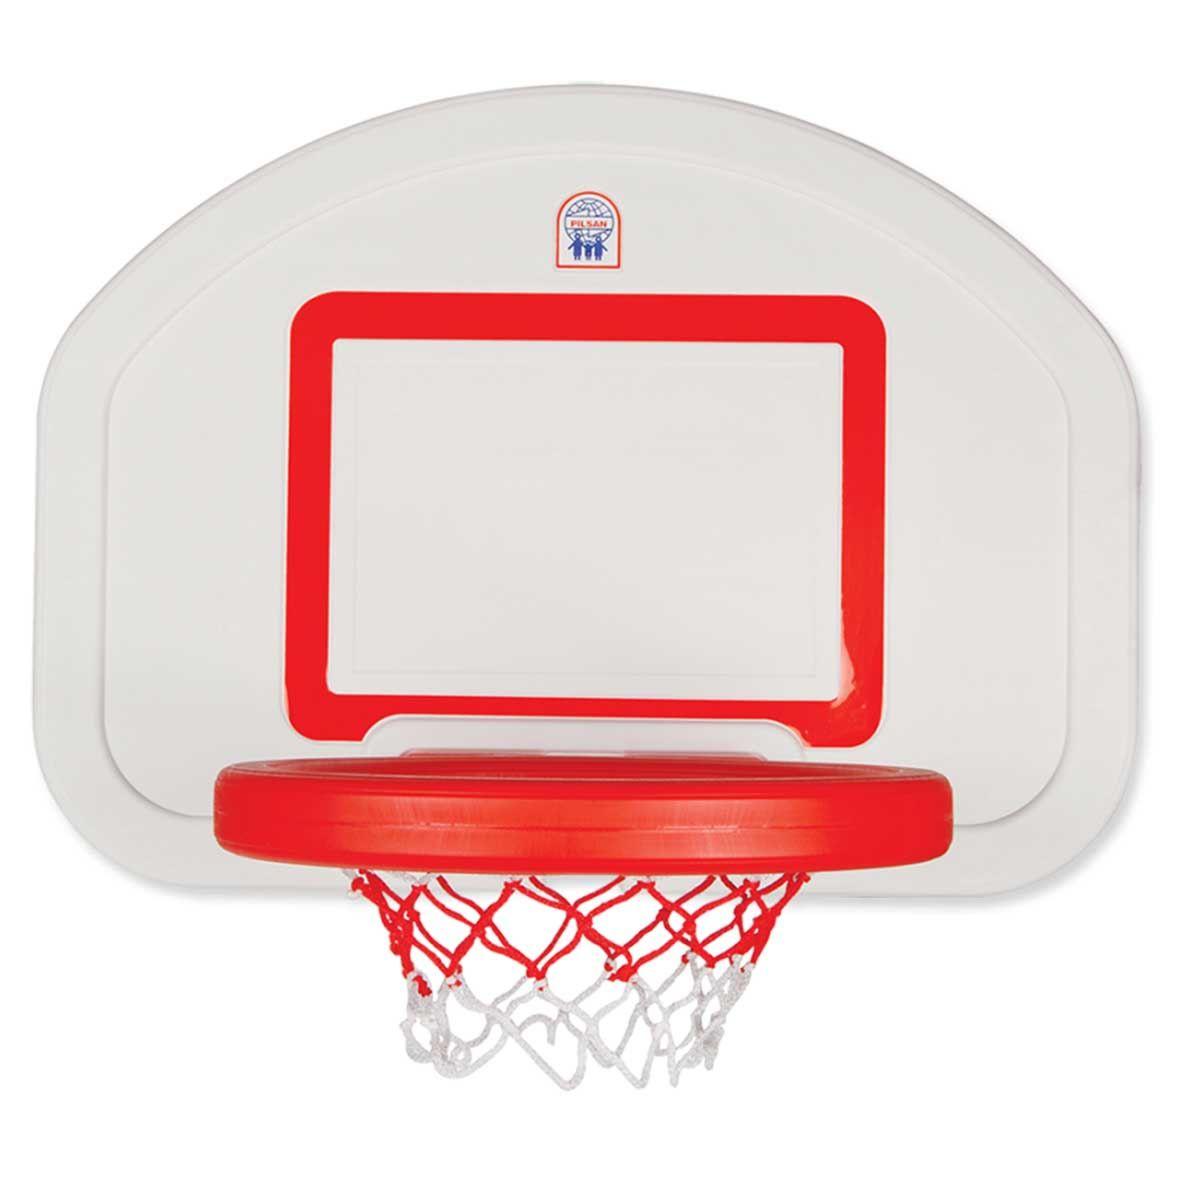 Pilsan Professional Hanging Basketball Hoop Set